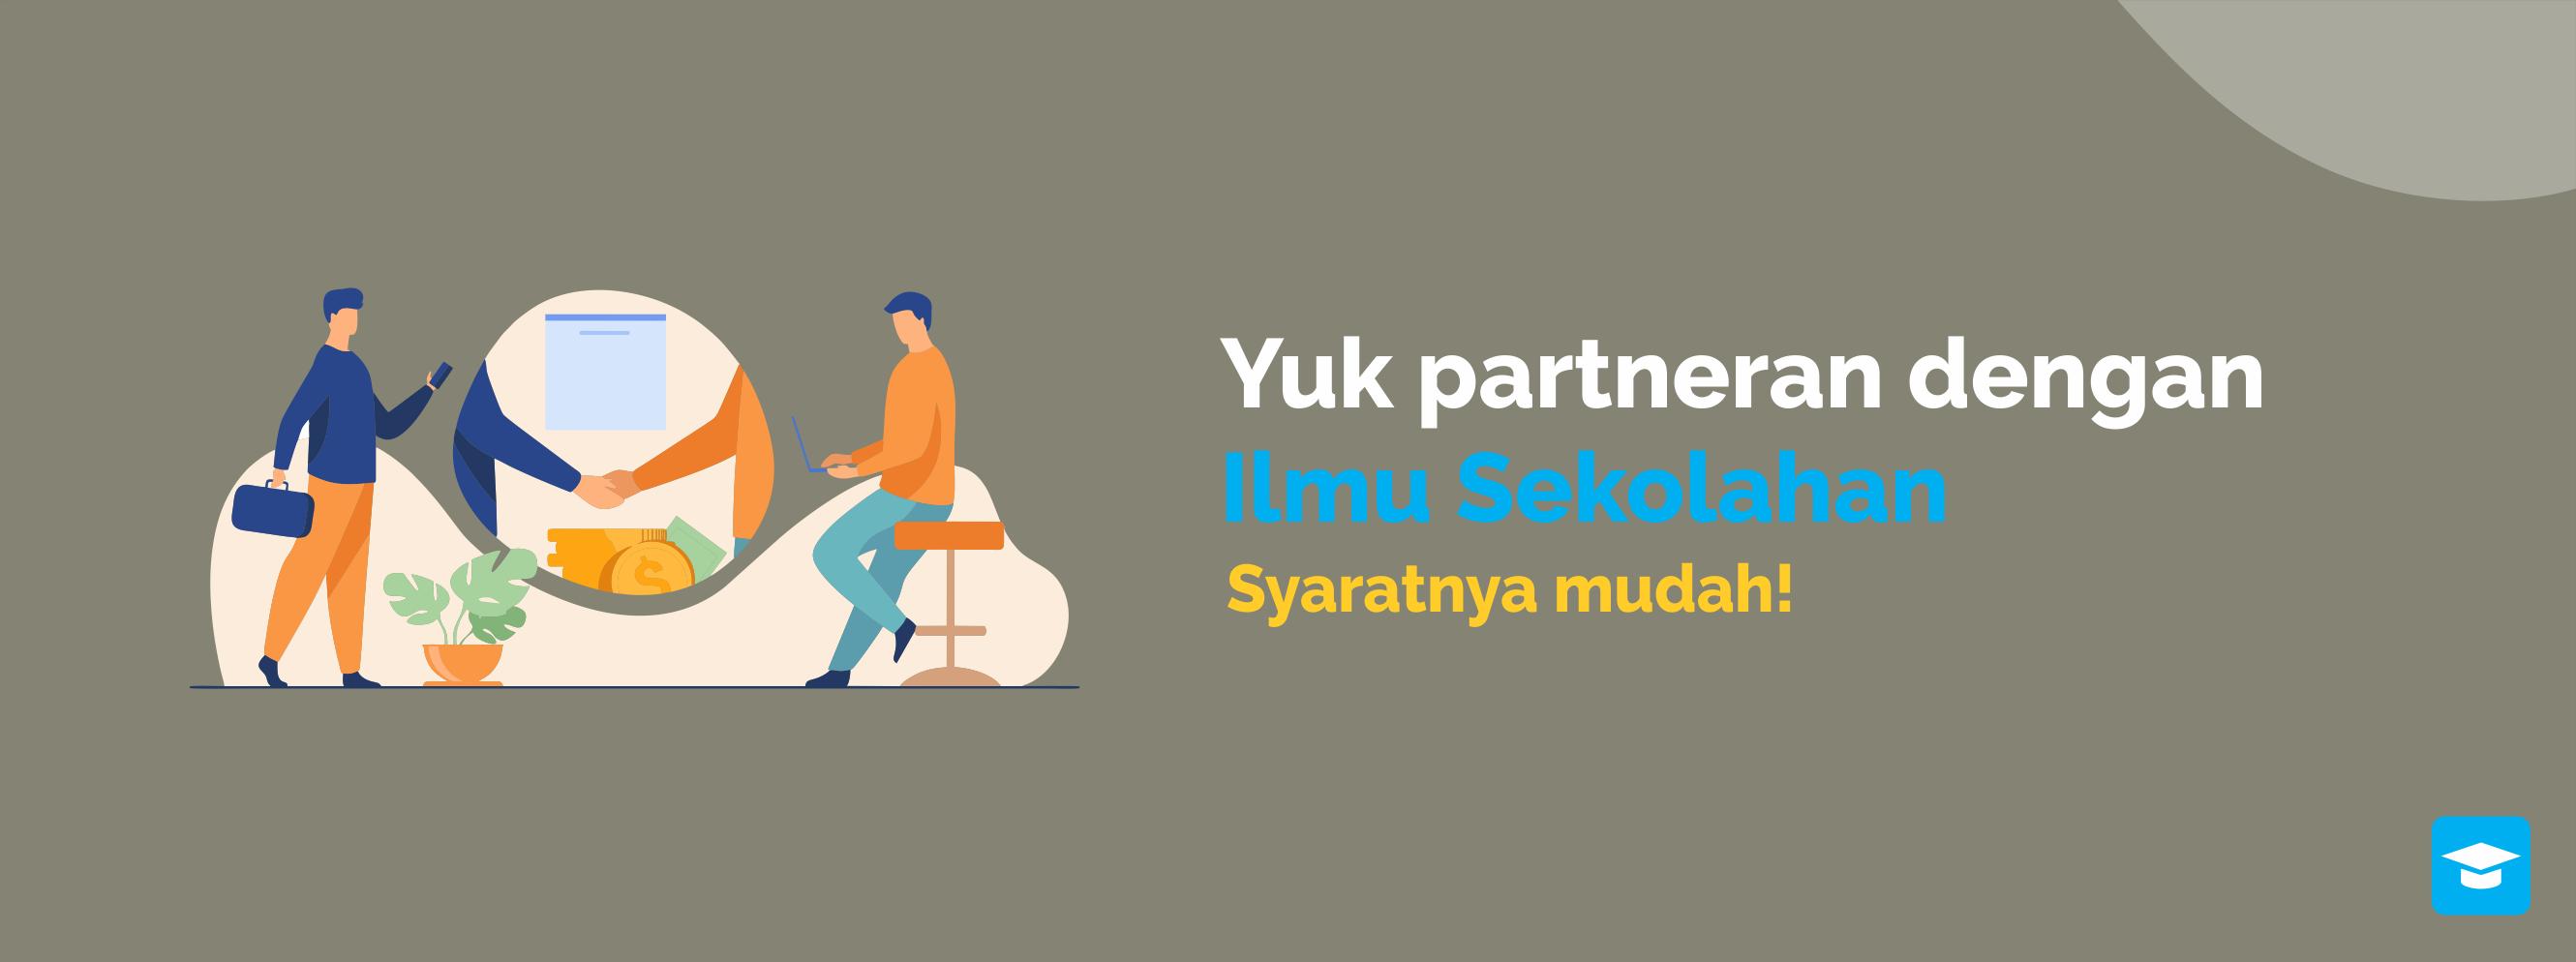 Partners Ilmu Sekolahan